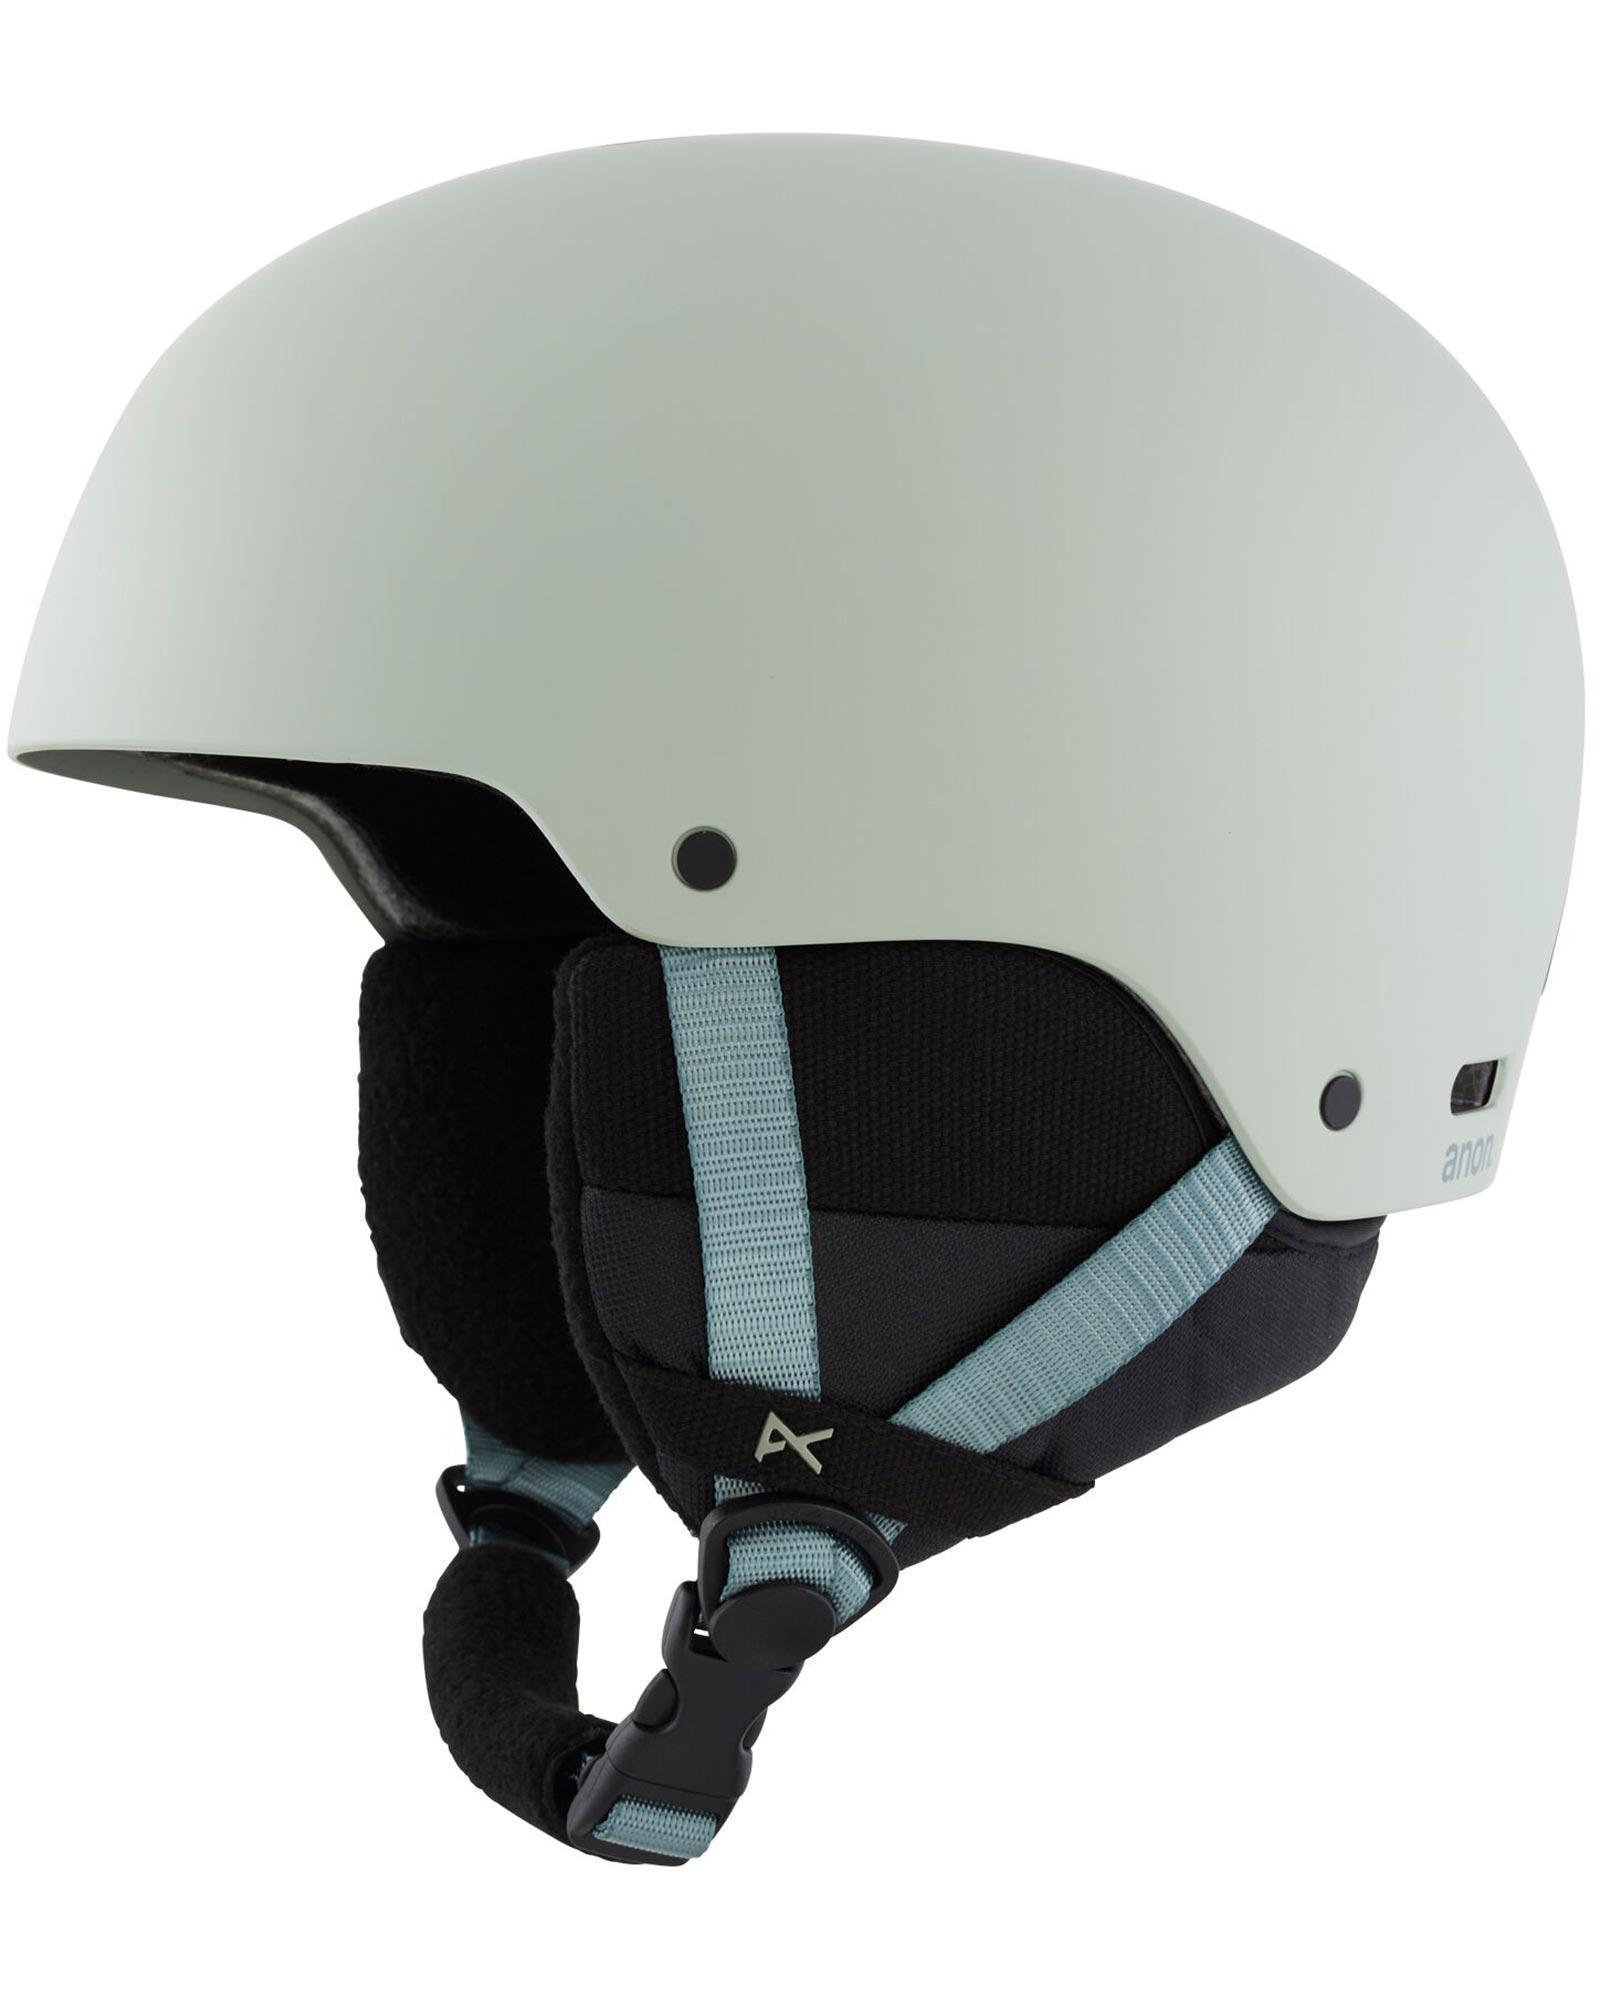 Anon Women's Greta 3 Ski/Snowboard Helmet 2021 0